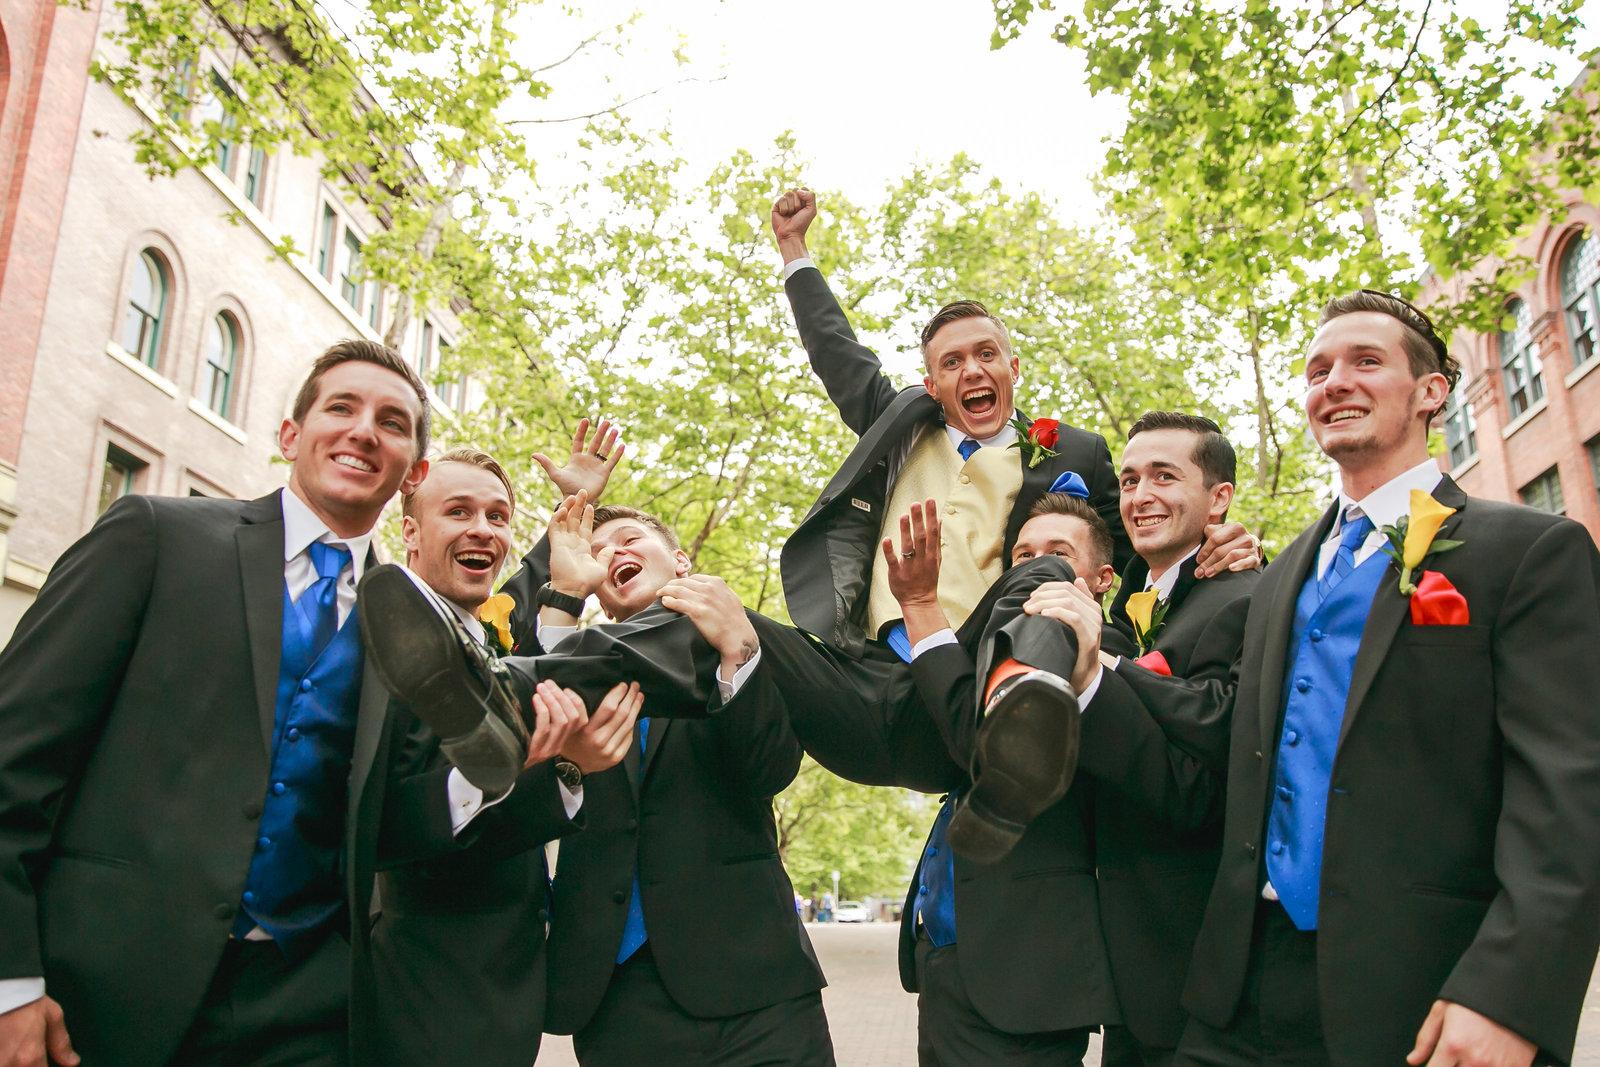 best-of-2015-weddings-lloyd-photographers430974